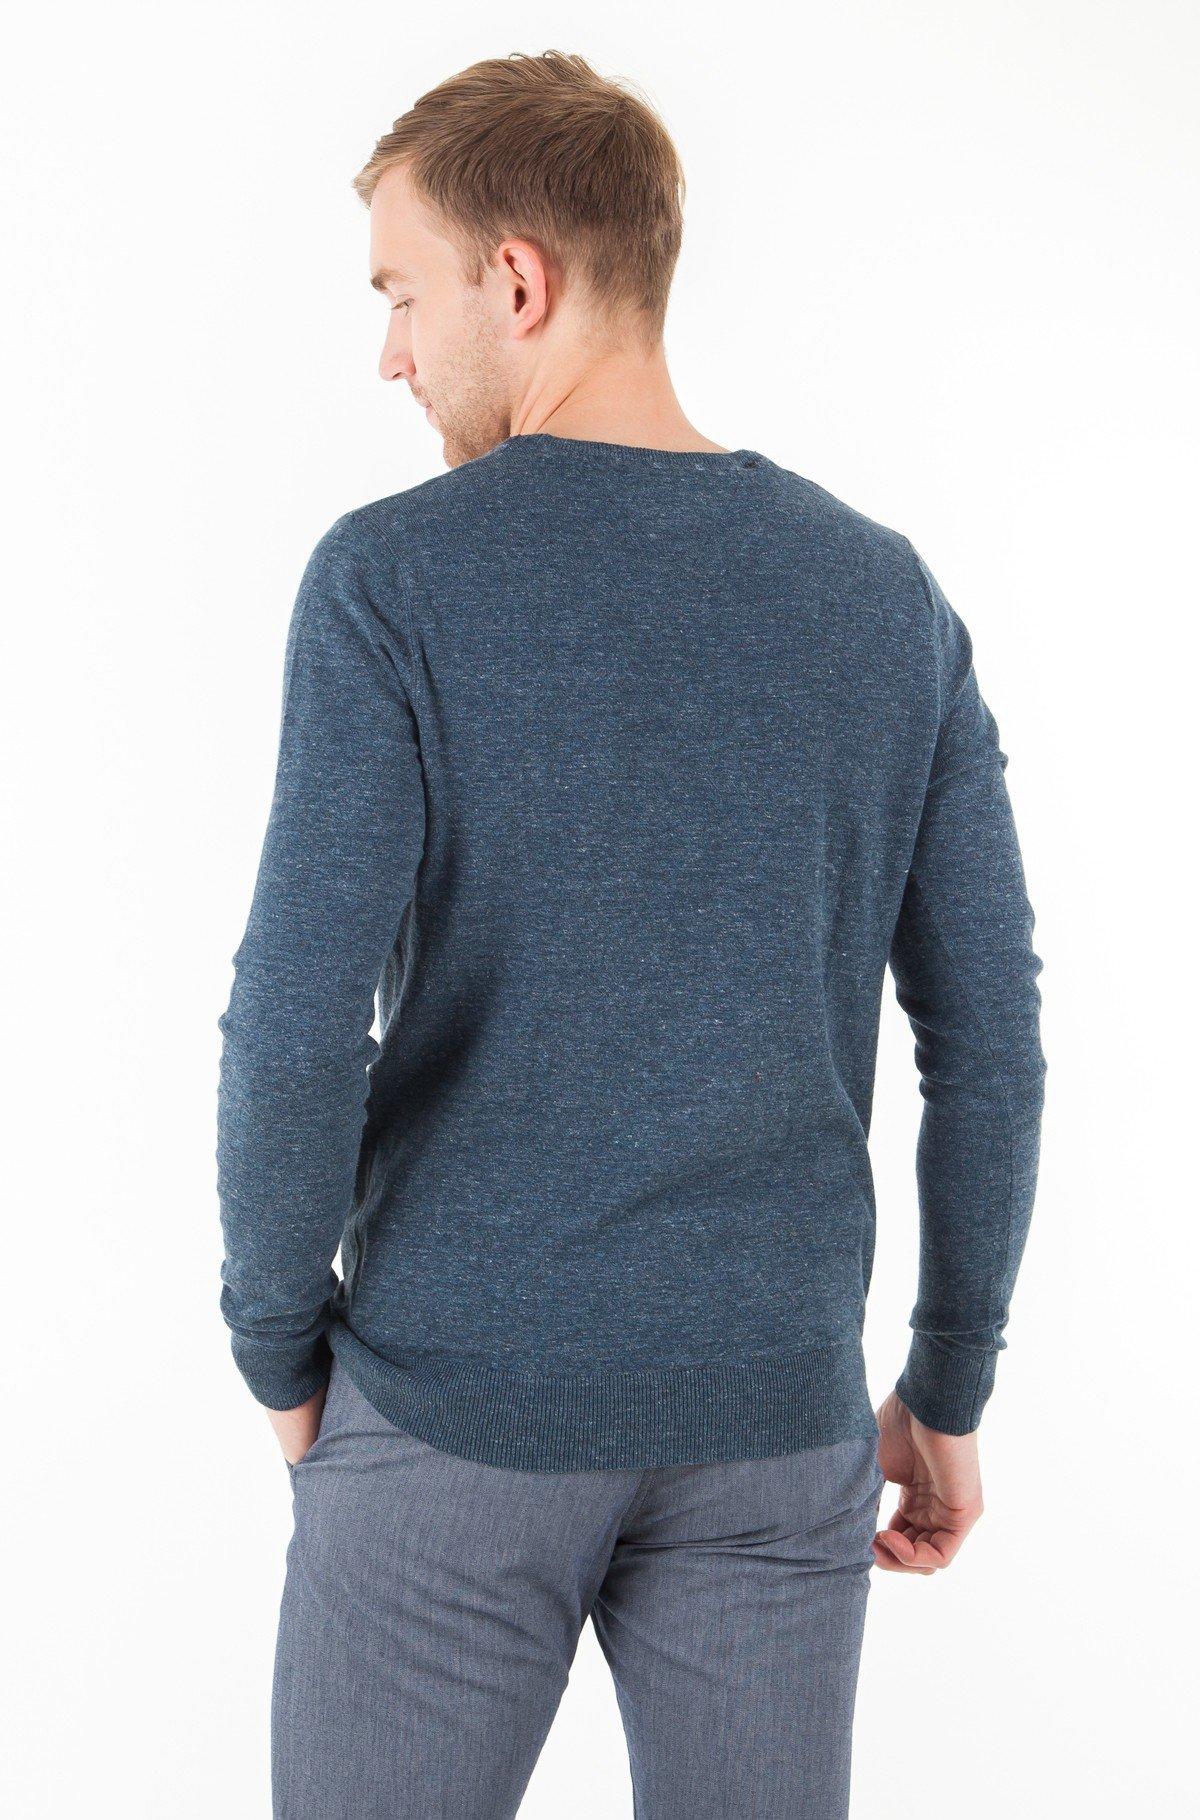 Sviiter Original cotton blend cn sweater l/s-full-2